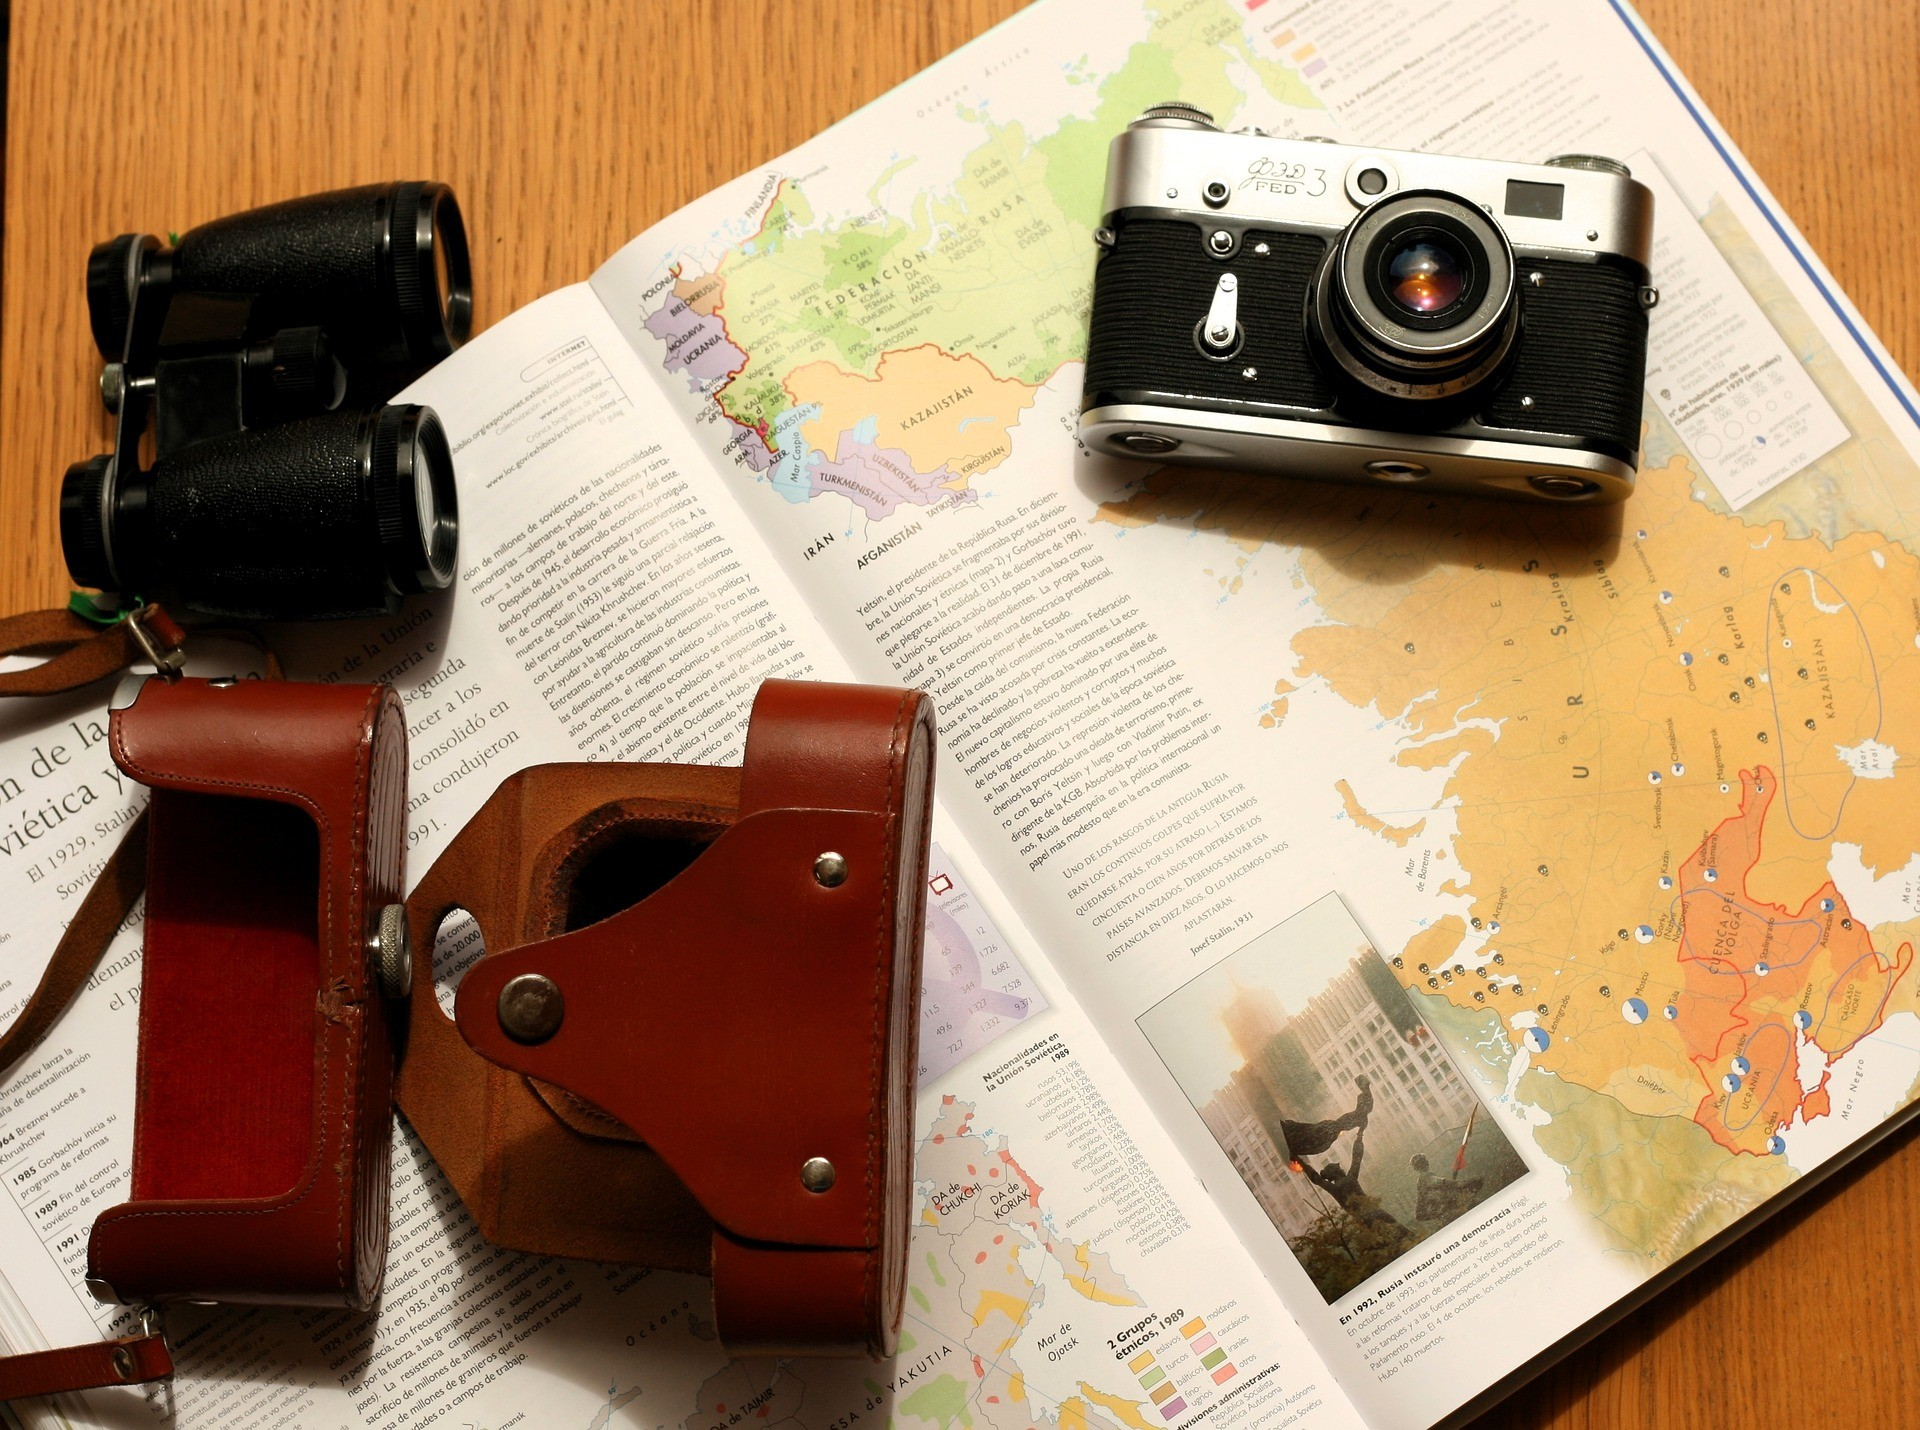 camera-1053048_1920